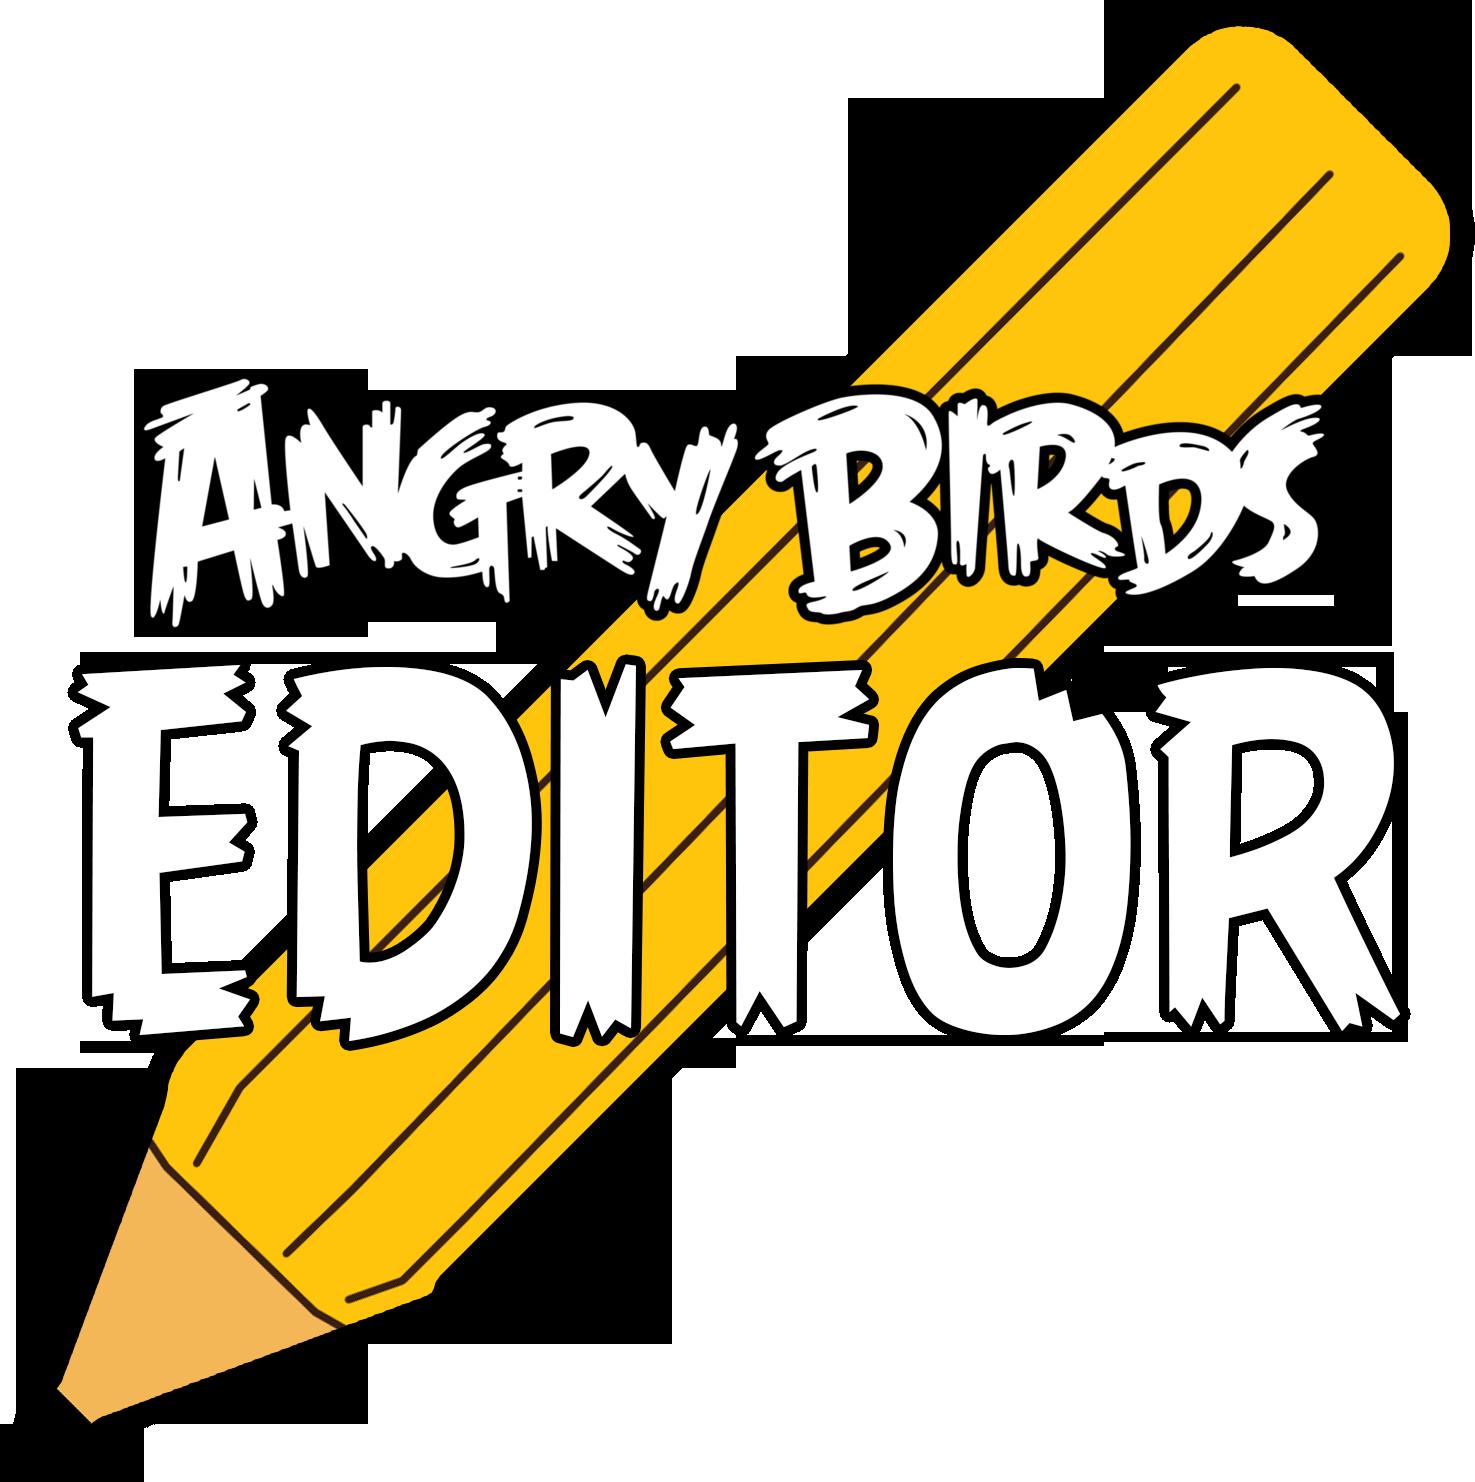 Angry Birds: Editor